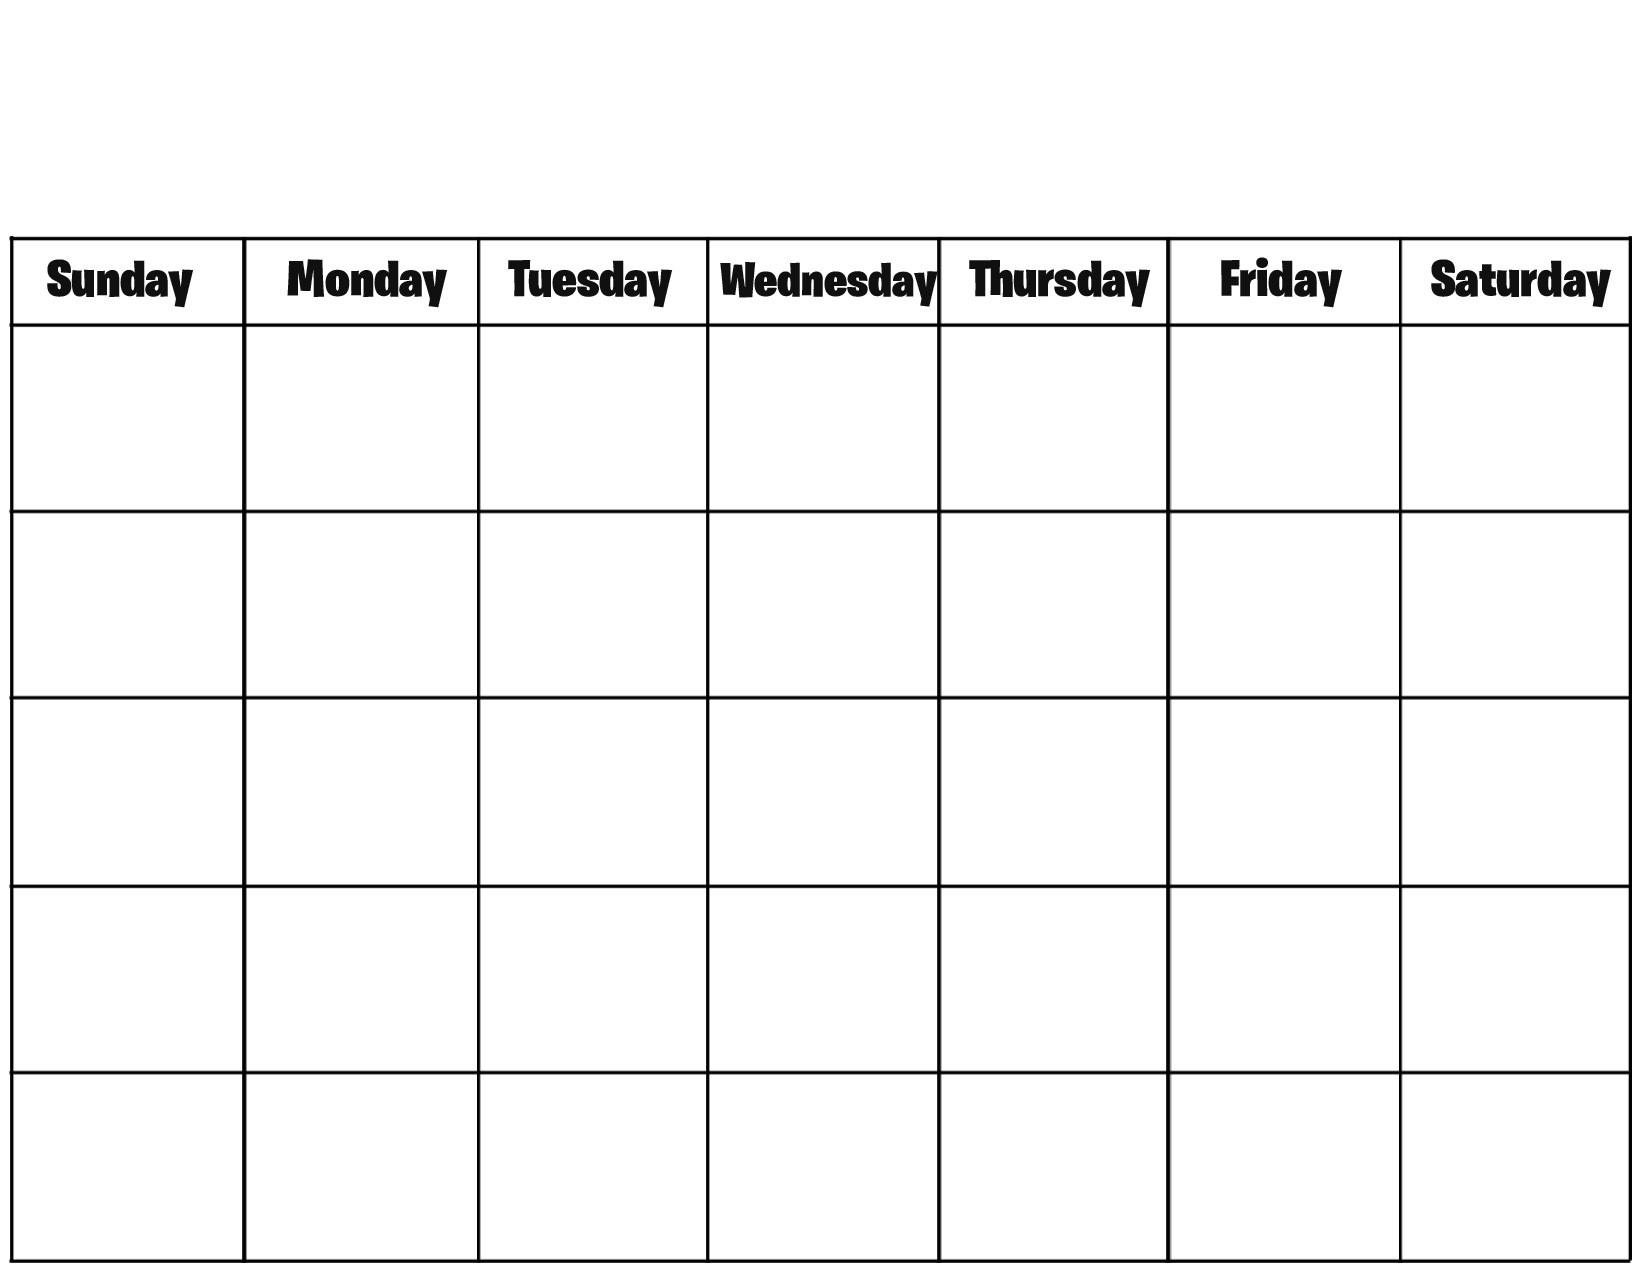 Free Printable Blank Calendar Pages Printable Calendar Templates inside Free Printable Blank Calendar Templates